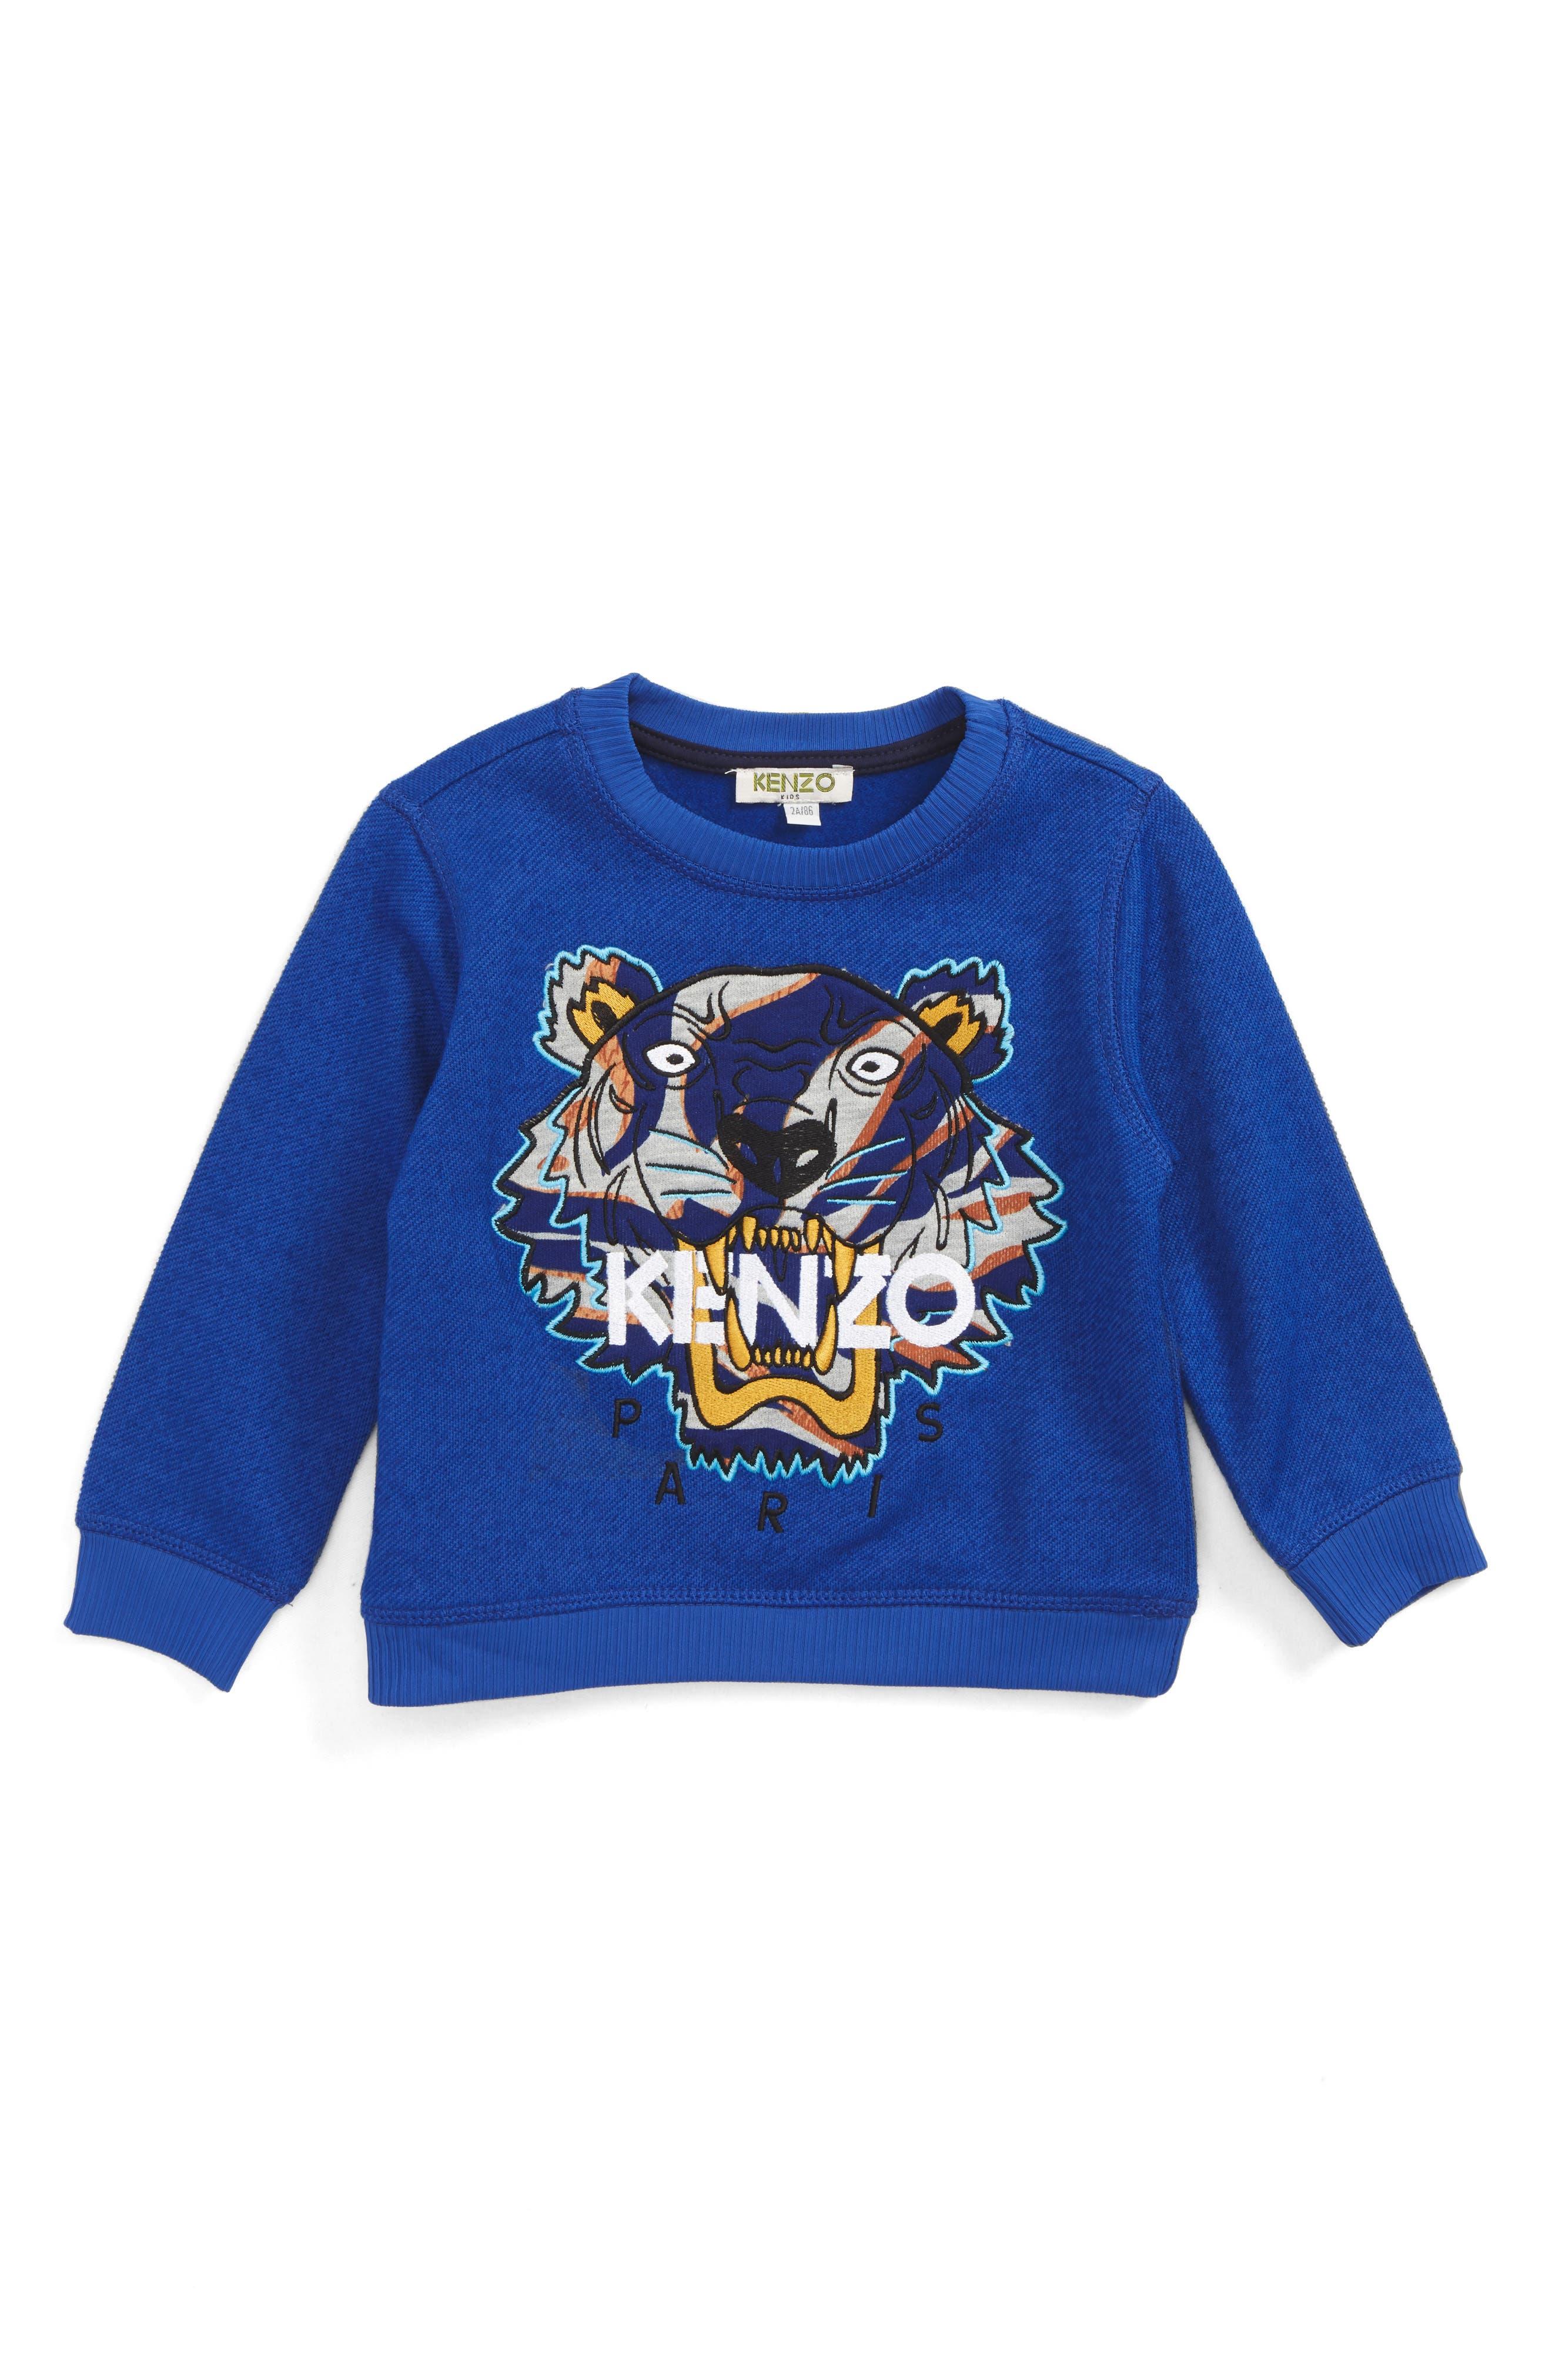 Alternate Image 1 Selected - KENZO Stripe Tiger Logo Sweatshirt (Toddler Boys, Little Boys & Big Boys)